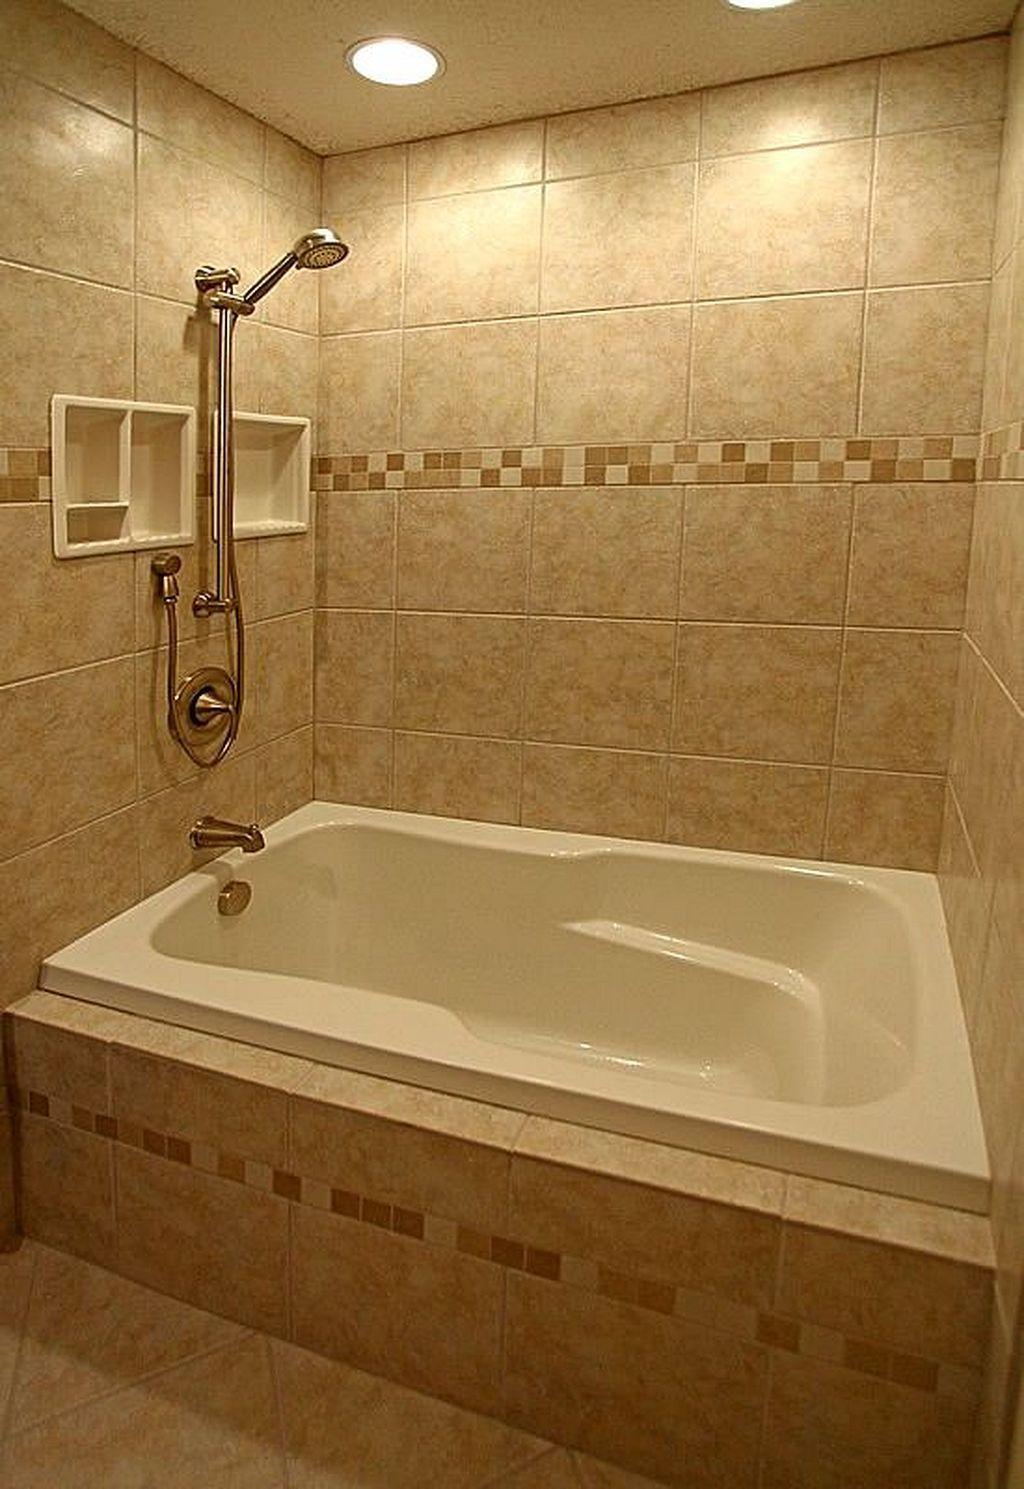 Small Bathroom Tub Shower Combo Ideas 15 Bathtub Tile Bathroom